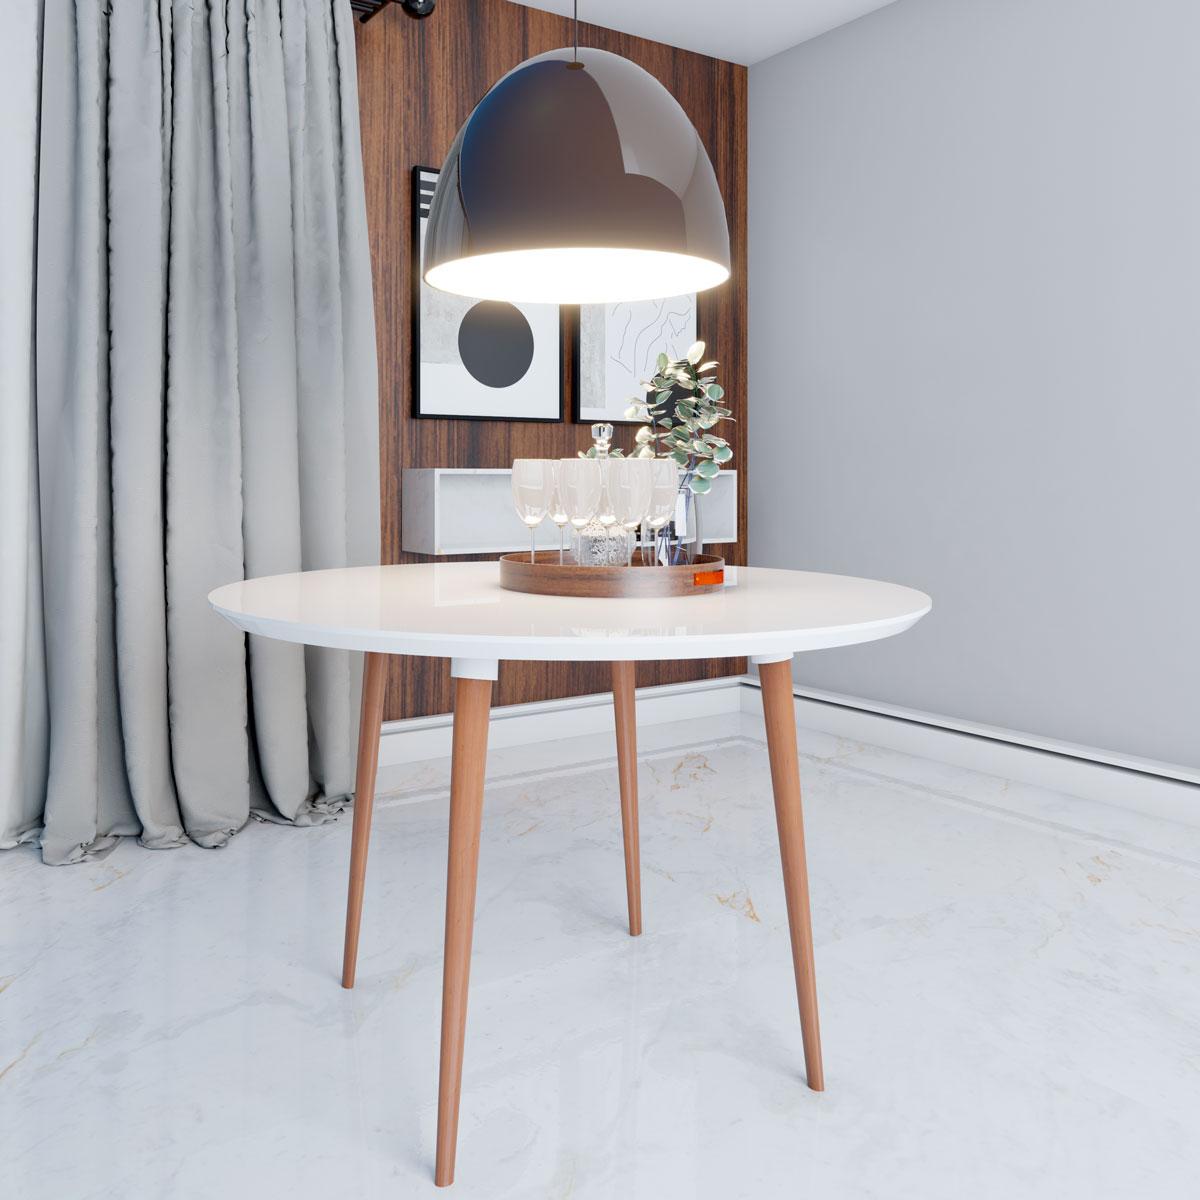 Mesa de Jantar Redonda Turmalina 4 Lugares Pés Palito Branco Clean com Vidro - RV Móveis